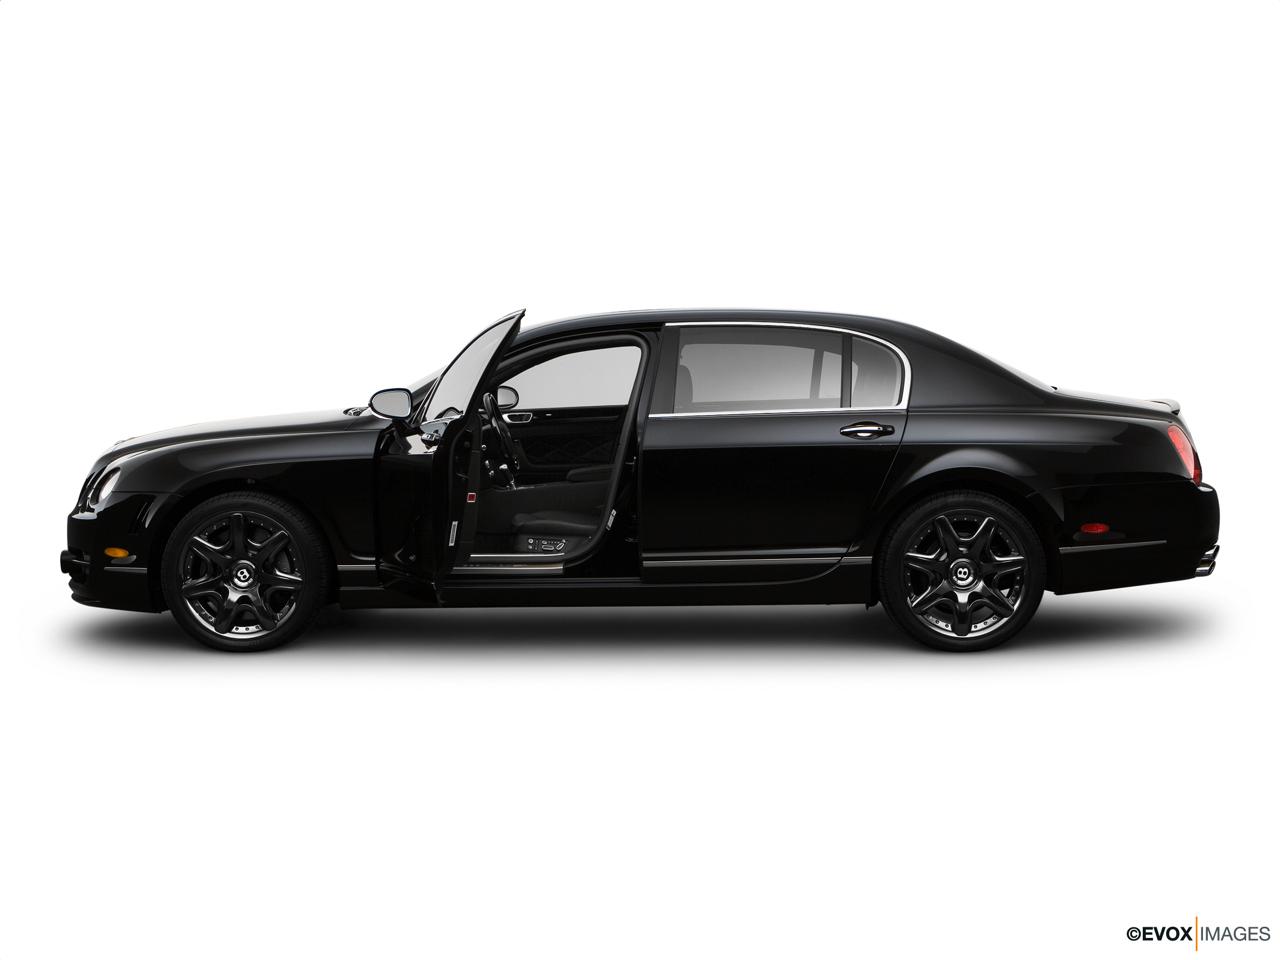 2014 Bentley Flying Spur Sedan - Driver\u0027s side profile with drivers side door open  sc 1 st  CarNow & 5182_st1280_037.jpg